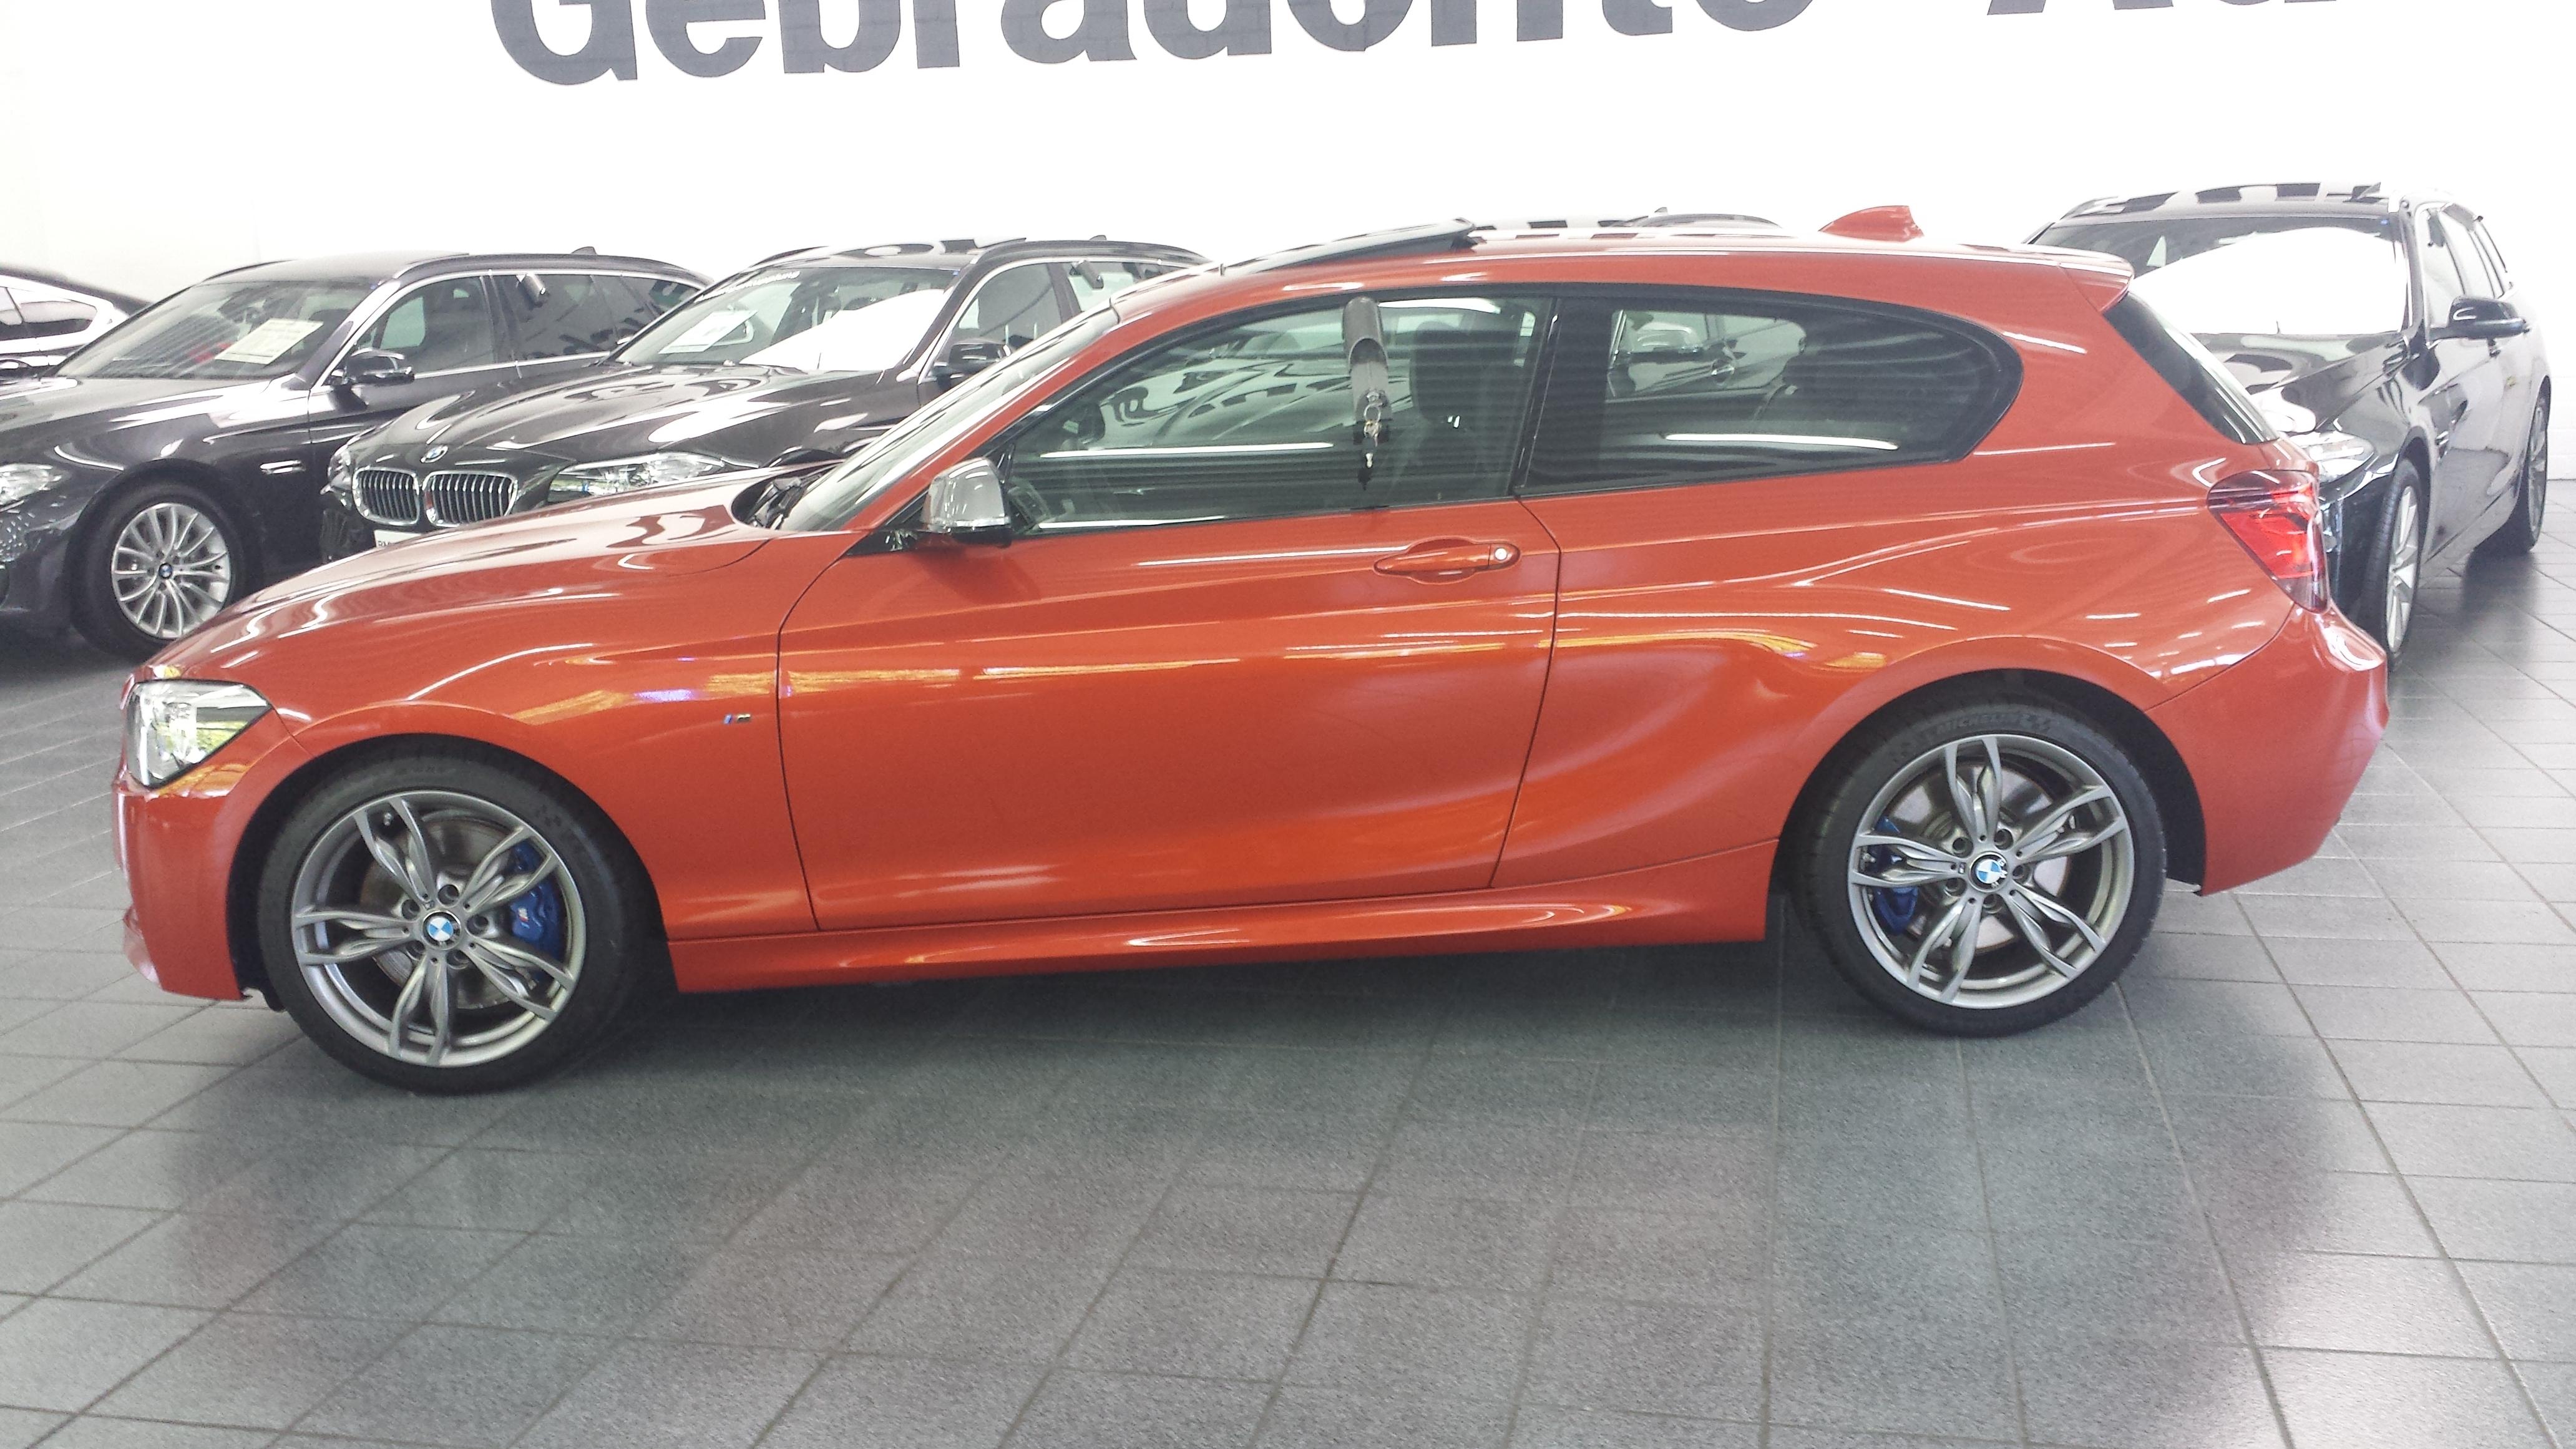 BMW 1er F20 F21 Valencia Orange metallic 9270626 1x PDC SENSOR hinten vorne